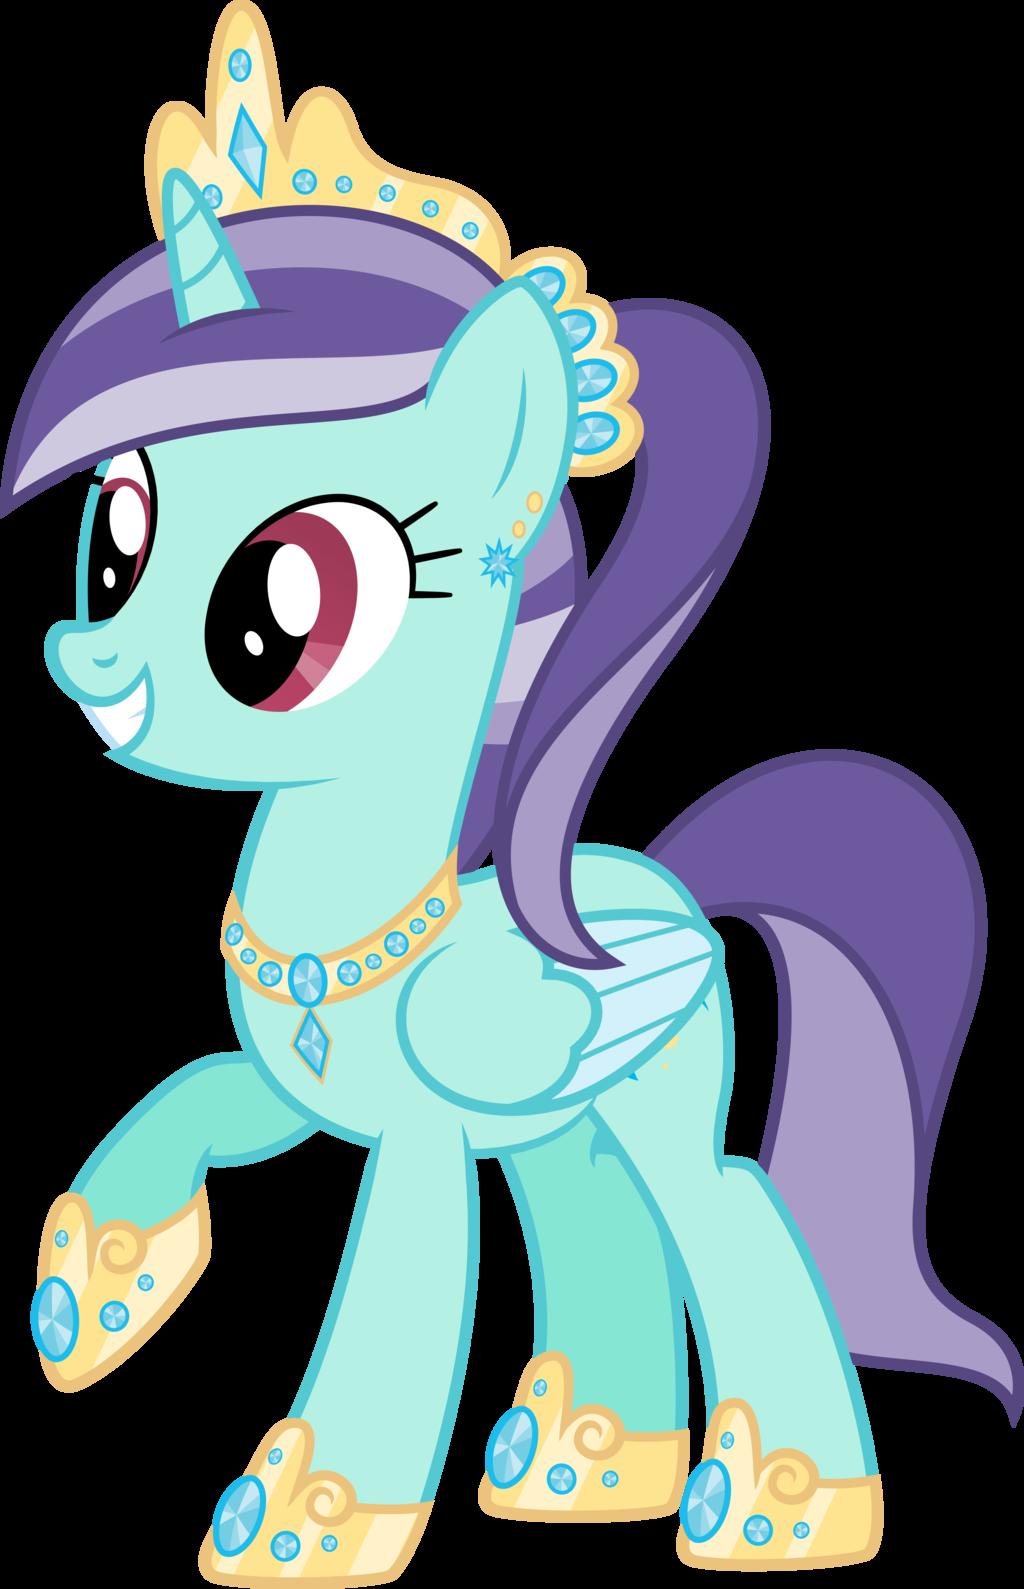 Drawn my little pony water Fans Crystal My m Pony